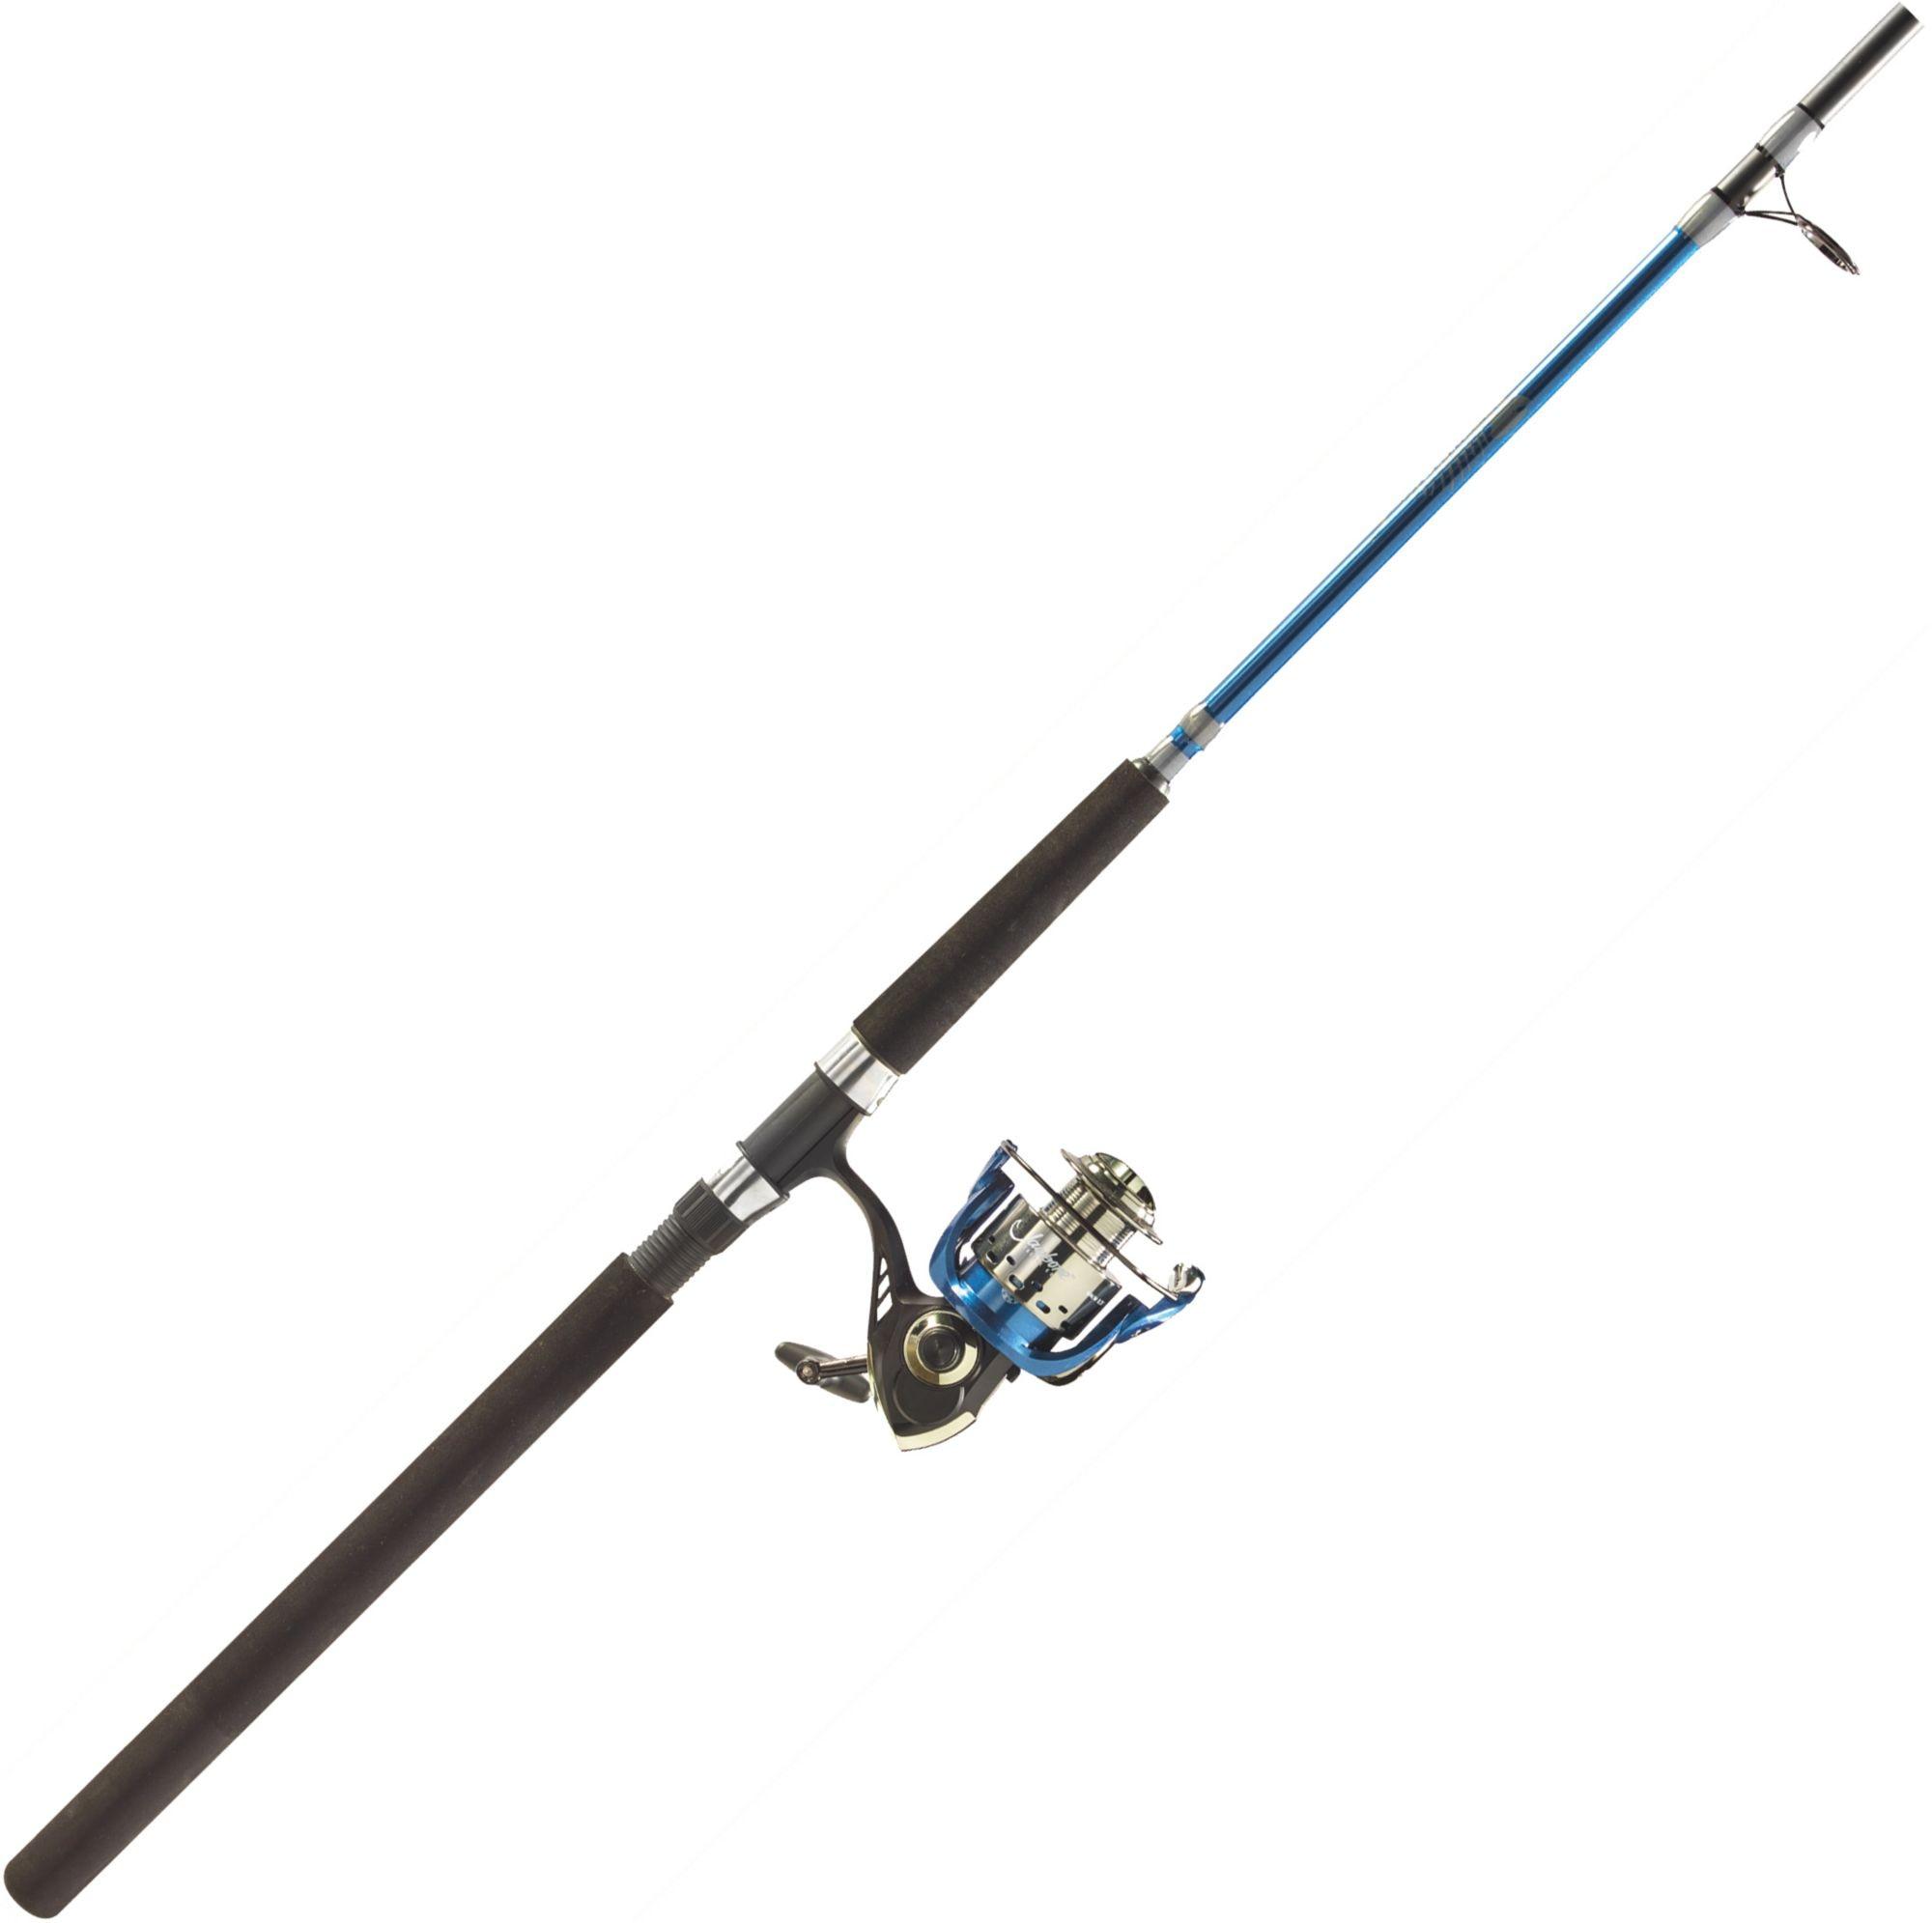 Jawbone Saltwater Combo Fishing Fishing Tips Fishing Gear Fishing Hacks Fishing Lures Bass Fishing Fl Saltwater Steelhead Fishing Saltwater Fishing